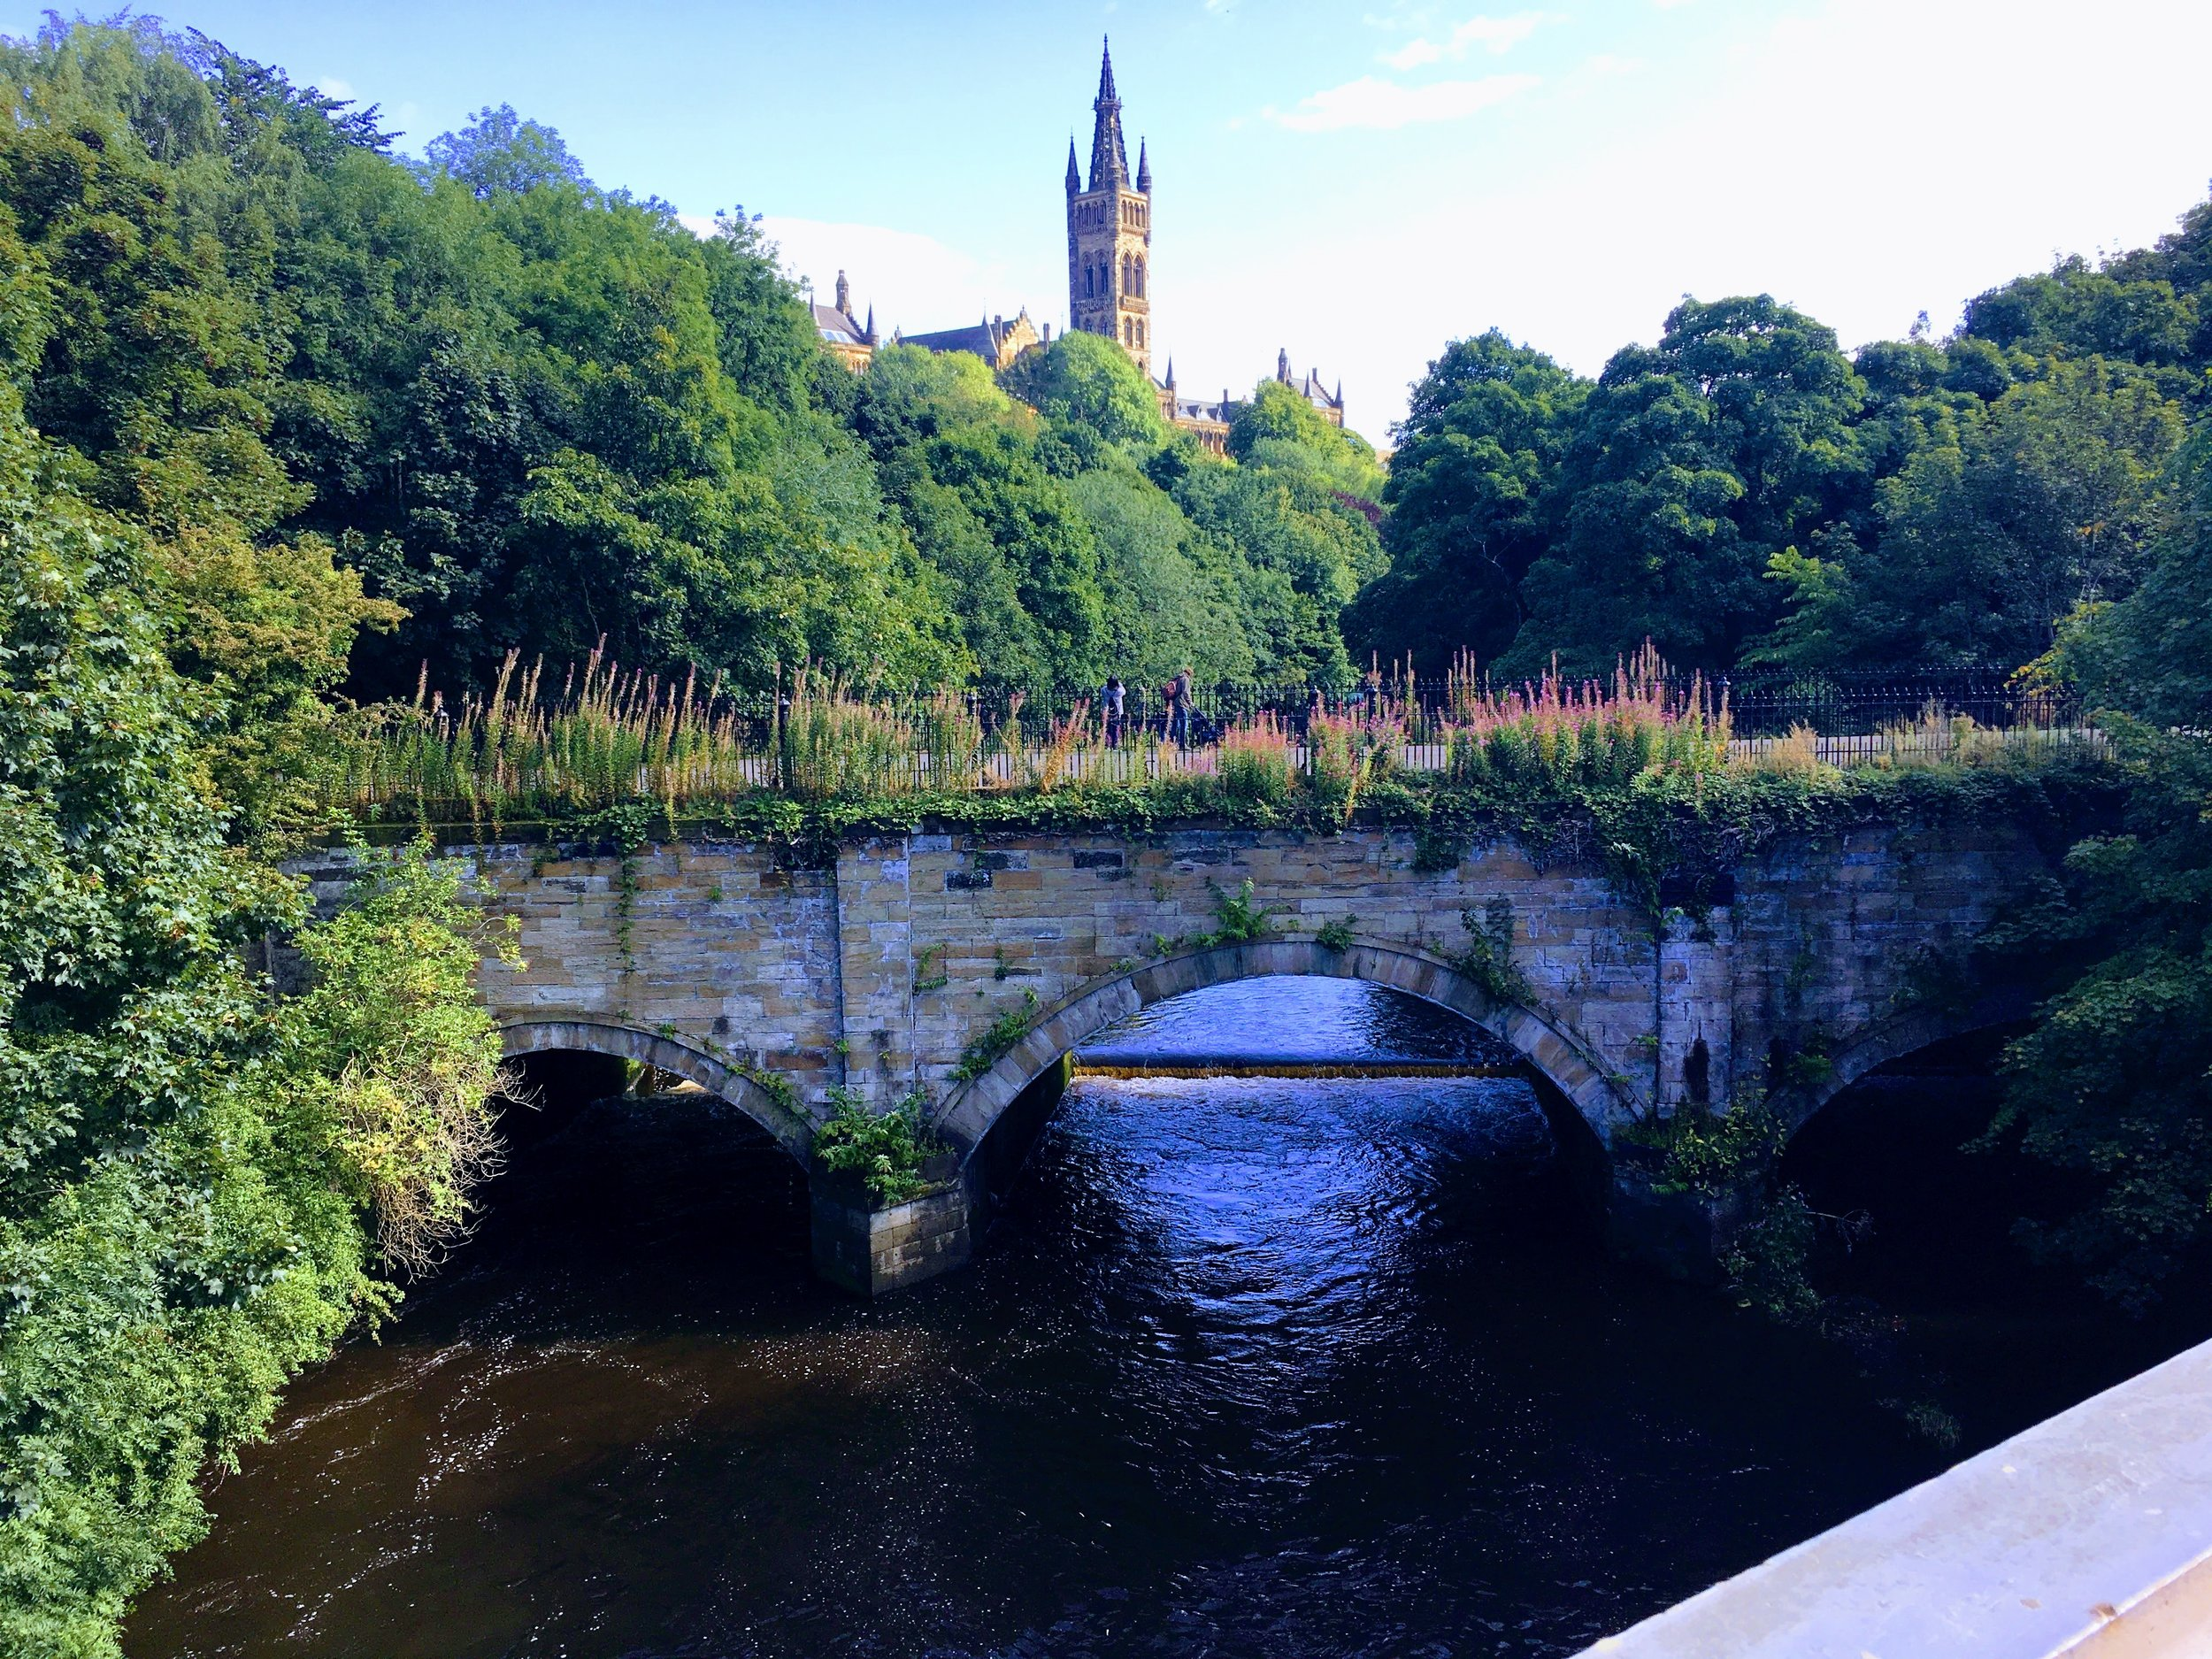 The bridge that I walked pass everyday to go to school in Glasgow, Scotland.